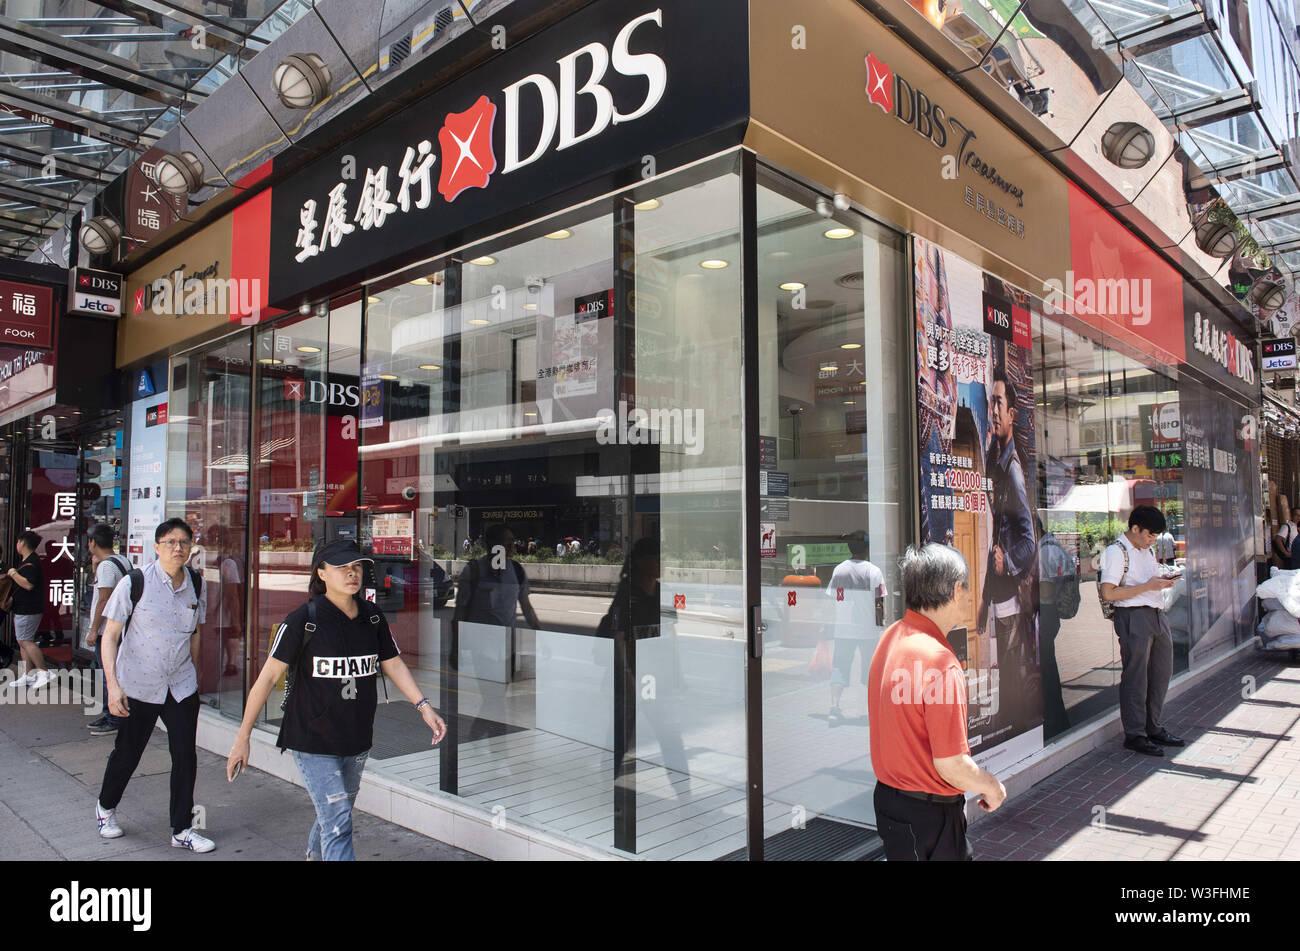 July 12, 2019 - Hong Kong, China - Investment bank and financial services corporation DBS branch is seen in Hong Kong. (Credit Image: © Budrul Chukrut/SOPA Images via ZUMA Wire) - Stock Image